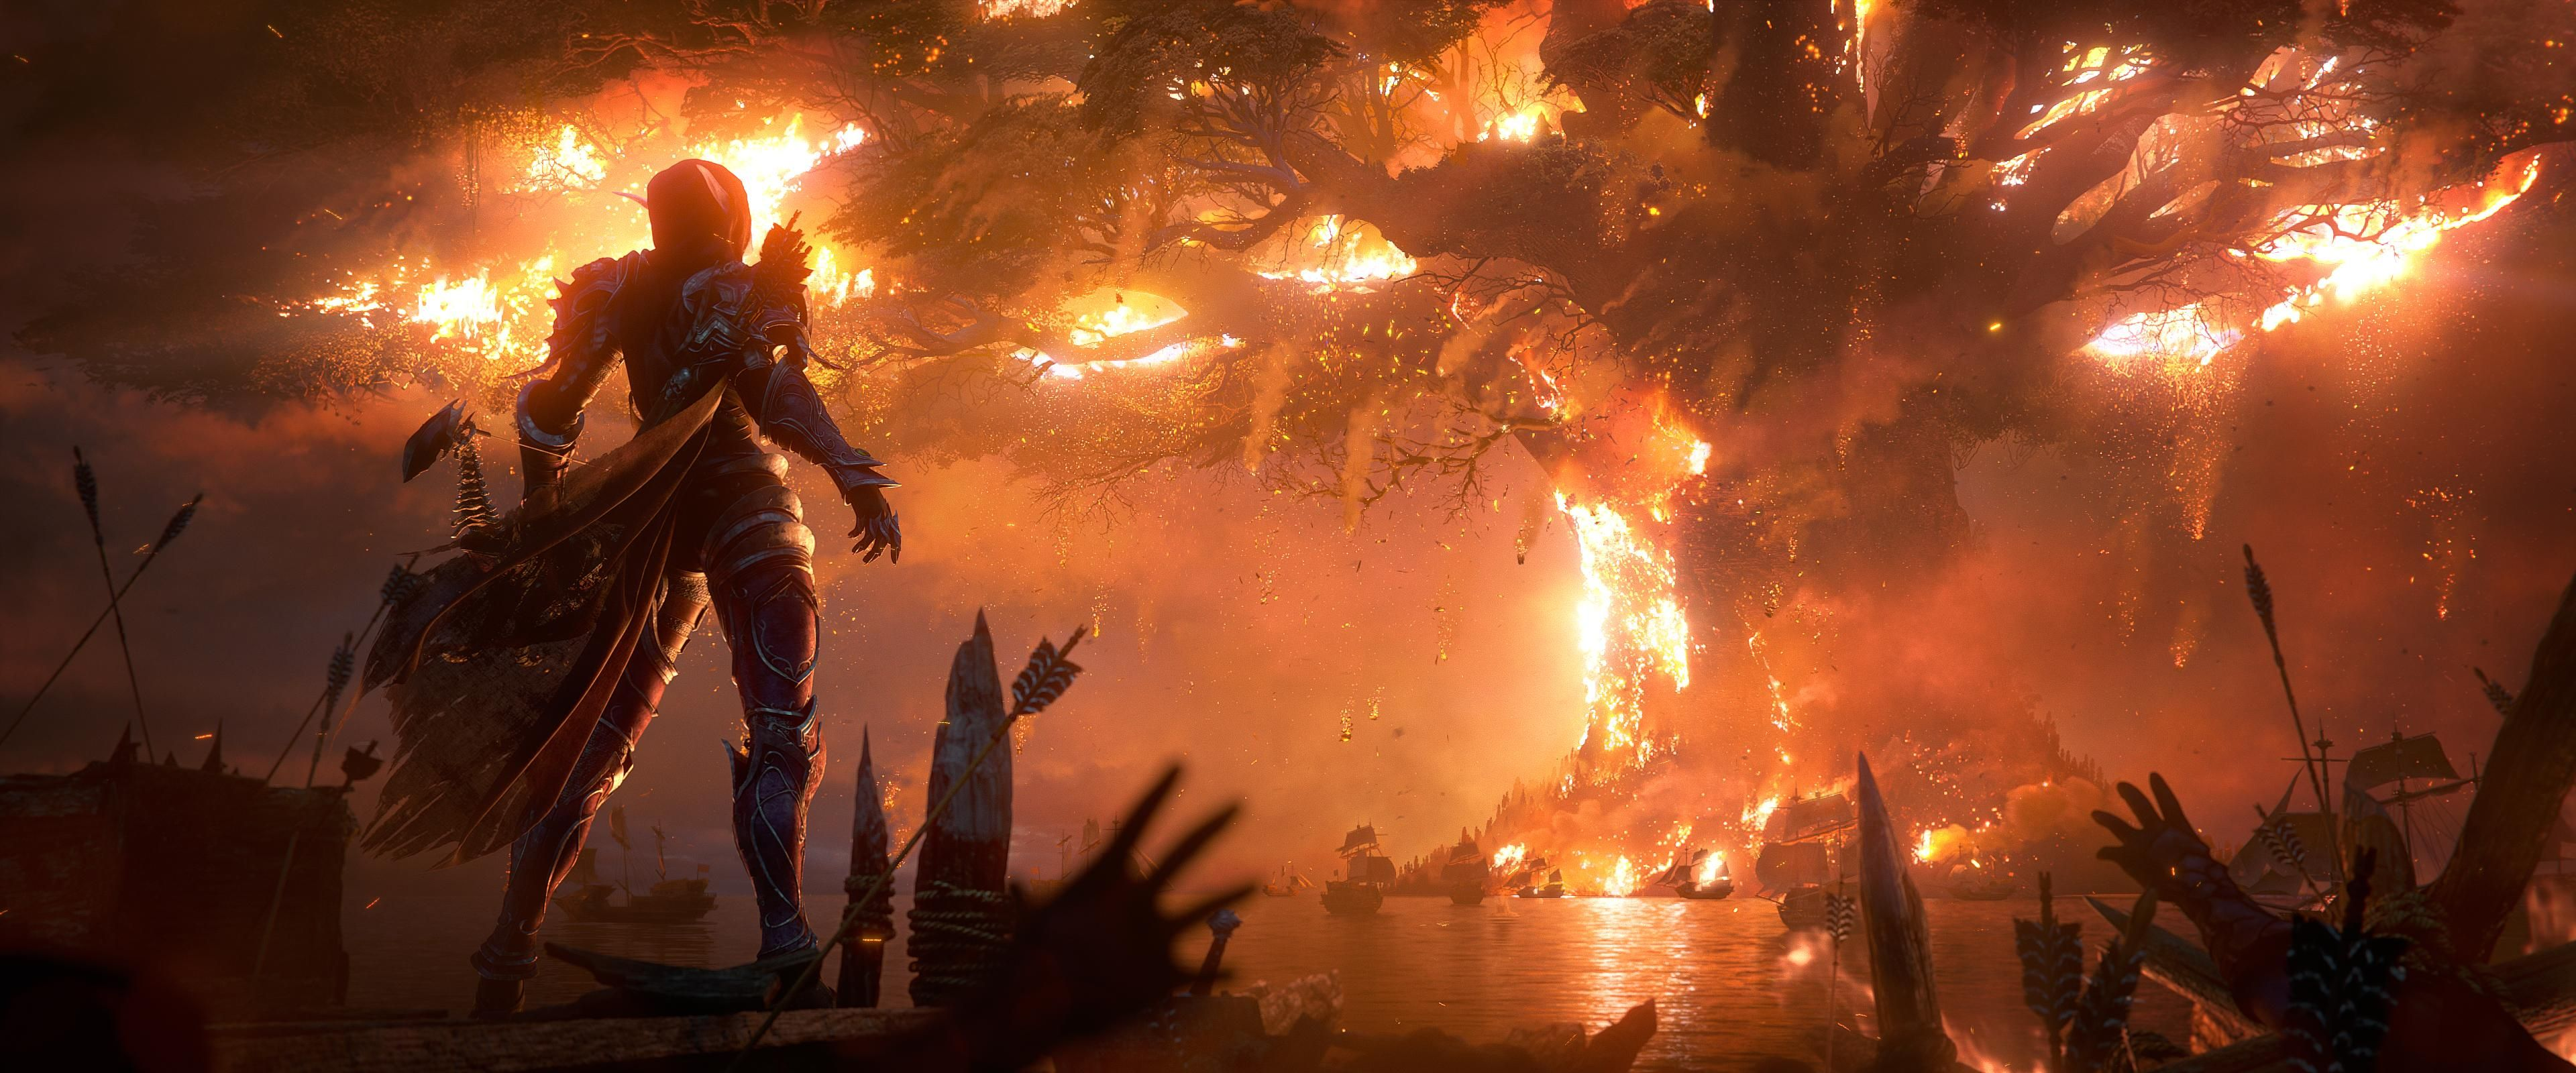 Sylvanas Windrunner Watching As Teldrassil Burns 3840x1600 Warcraft World Of Warcraft Heaven Wallpaper